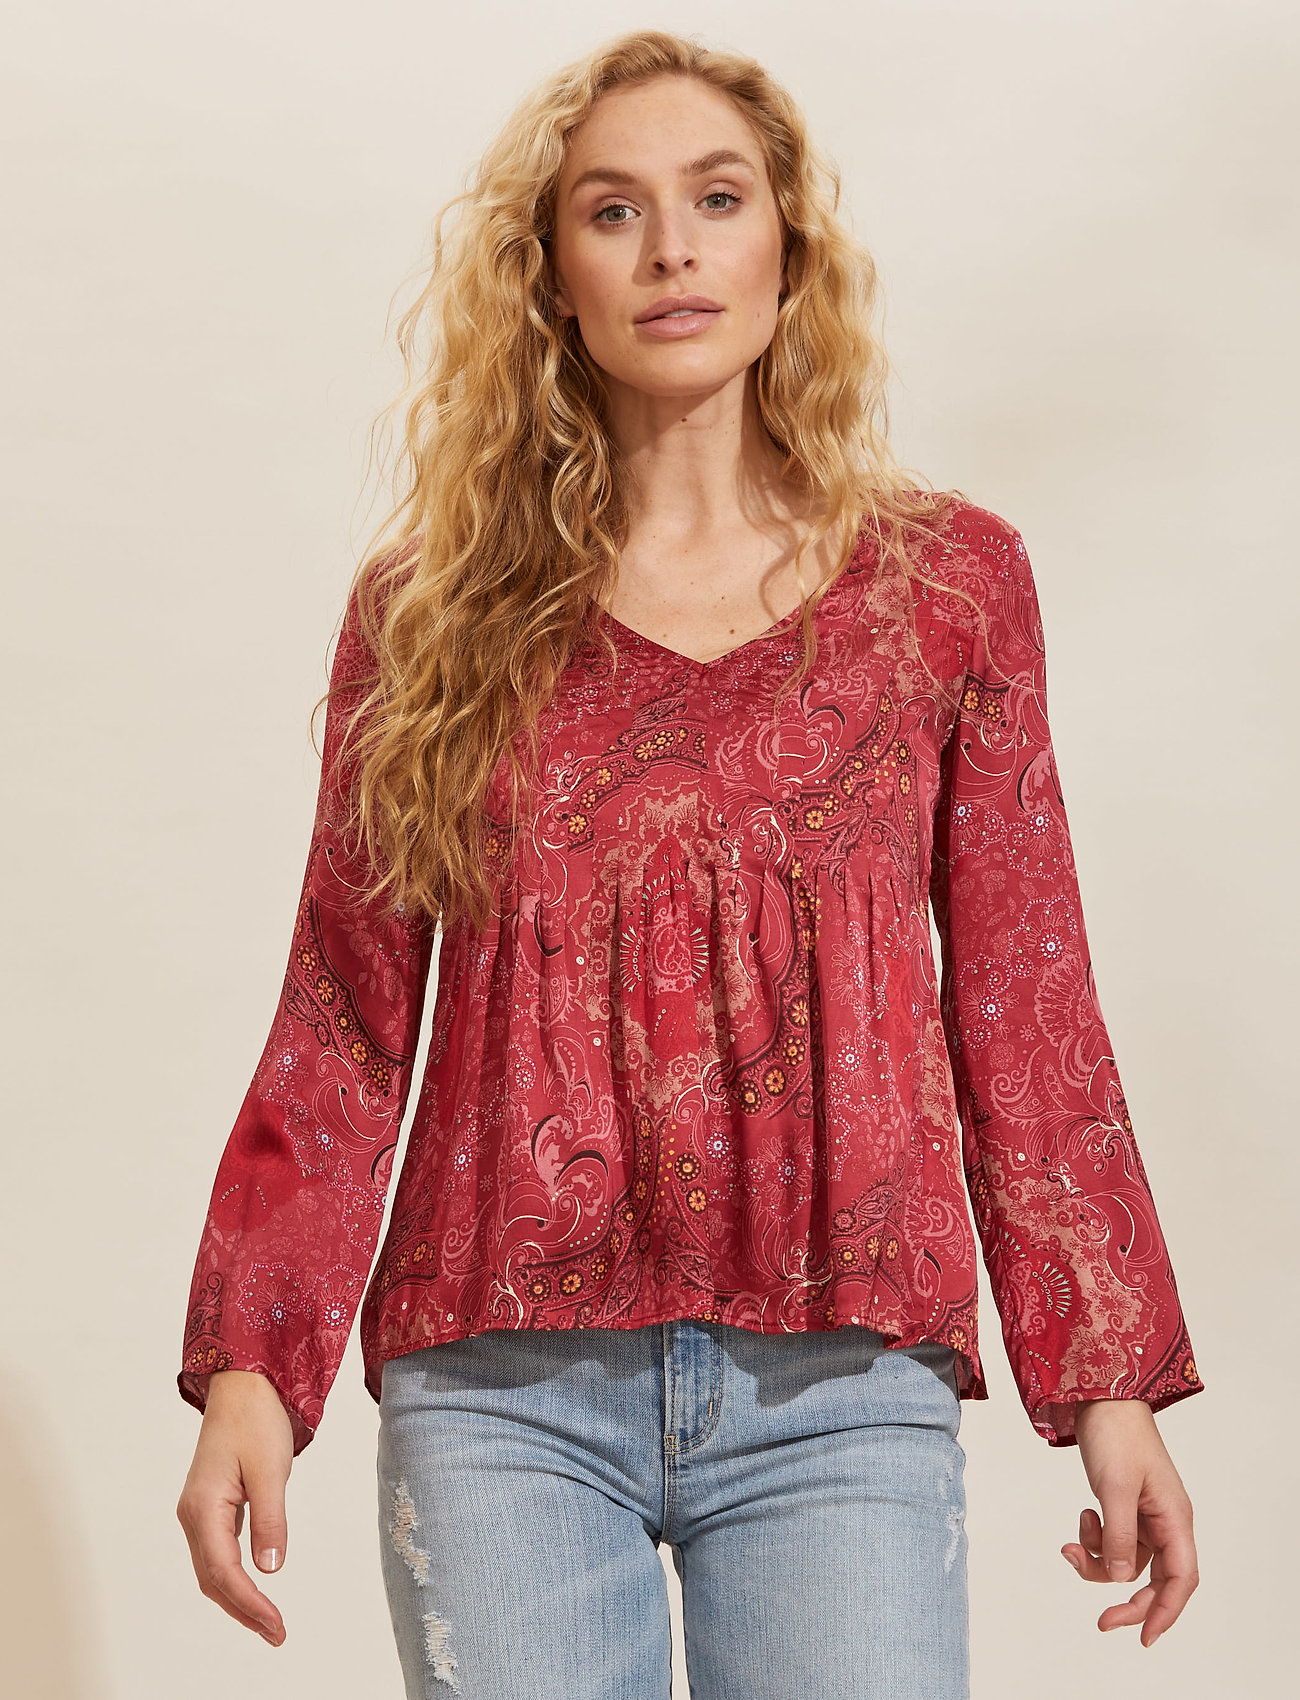 ODD MOLLY - Amélie Blouse - langærmede bluser - red elderberry - 0